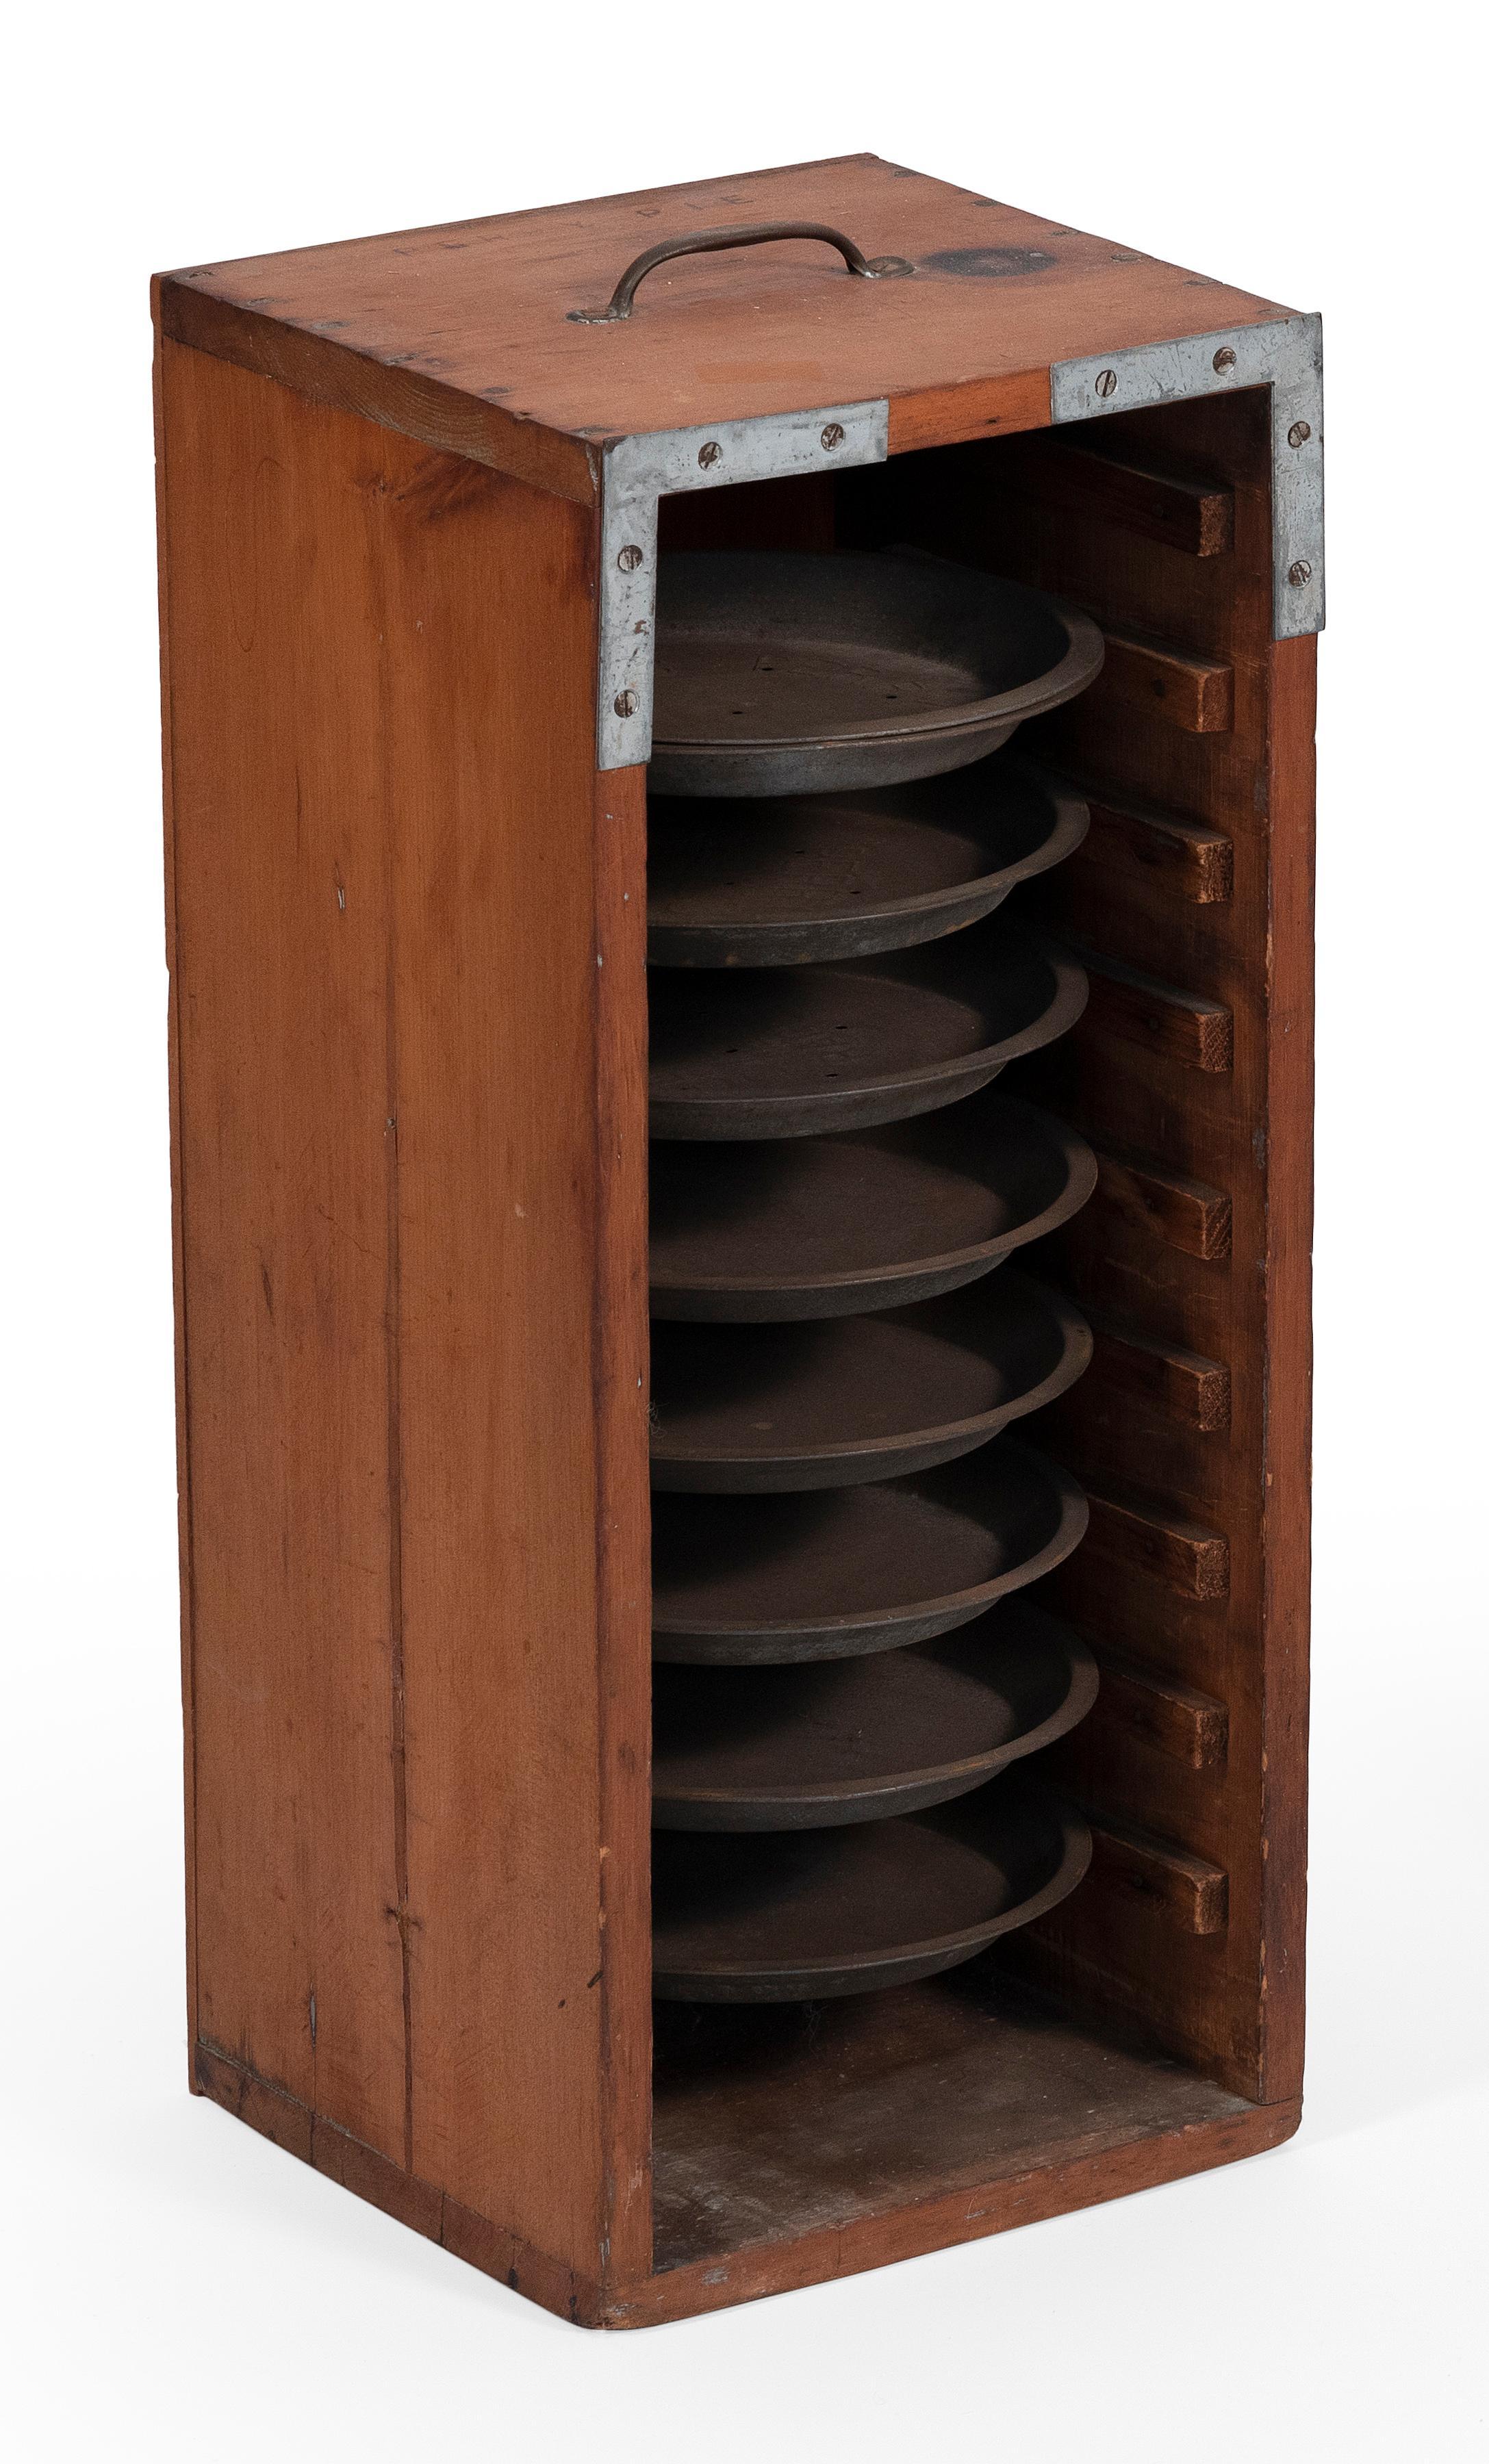 """PERRY'S PIES"" WOODEN PIE RACK 20th Century Tin diameters 9"". Case height 24"". Width 10.5"". Depth 10""."